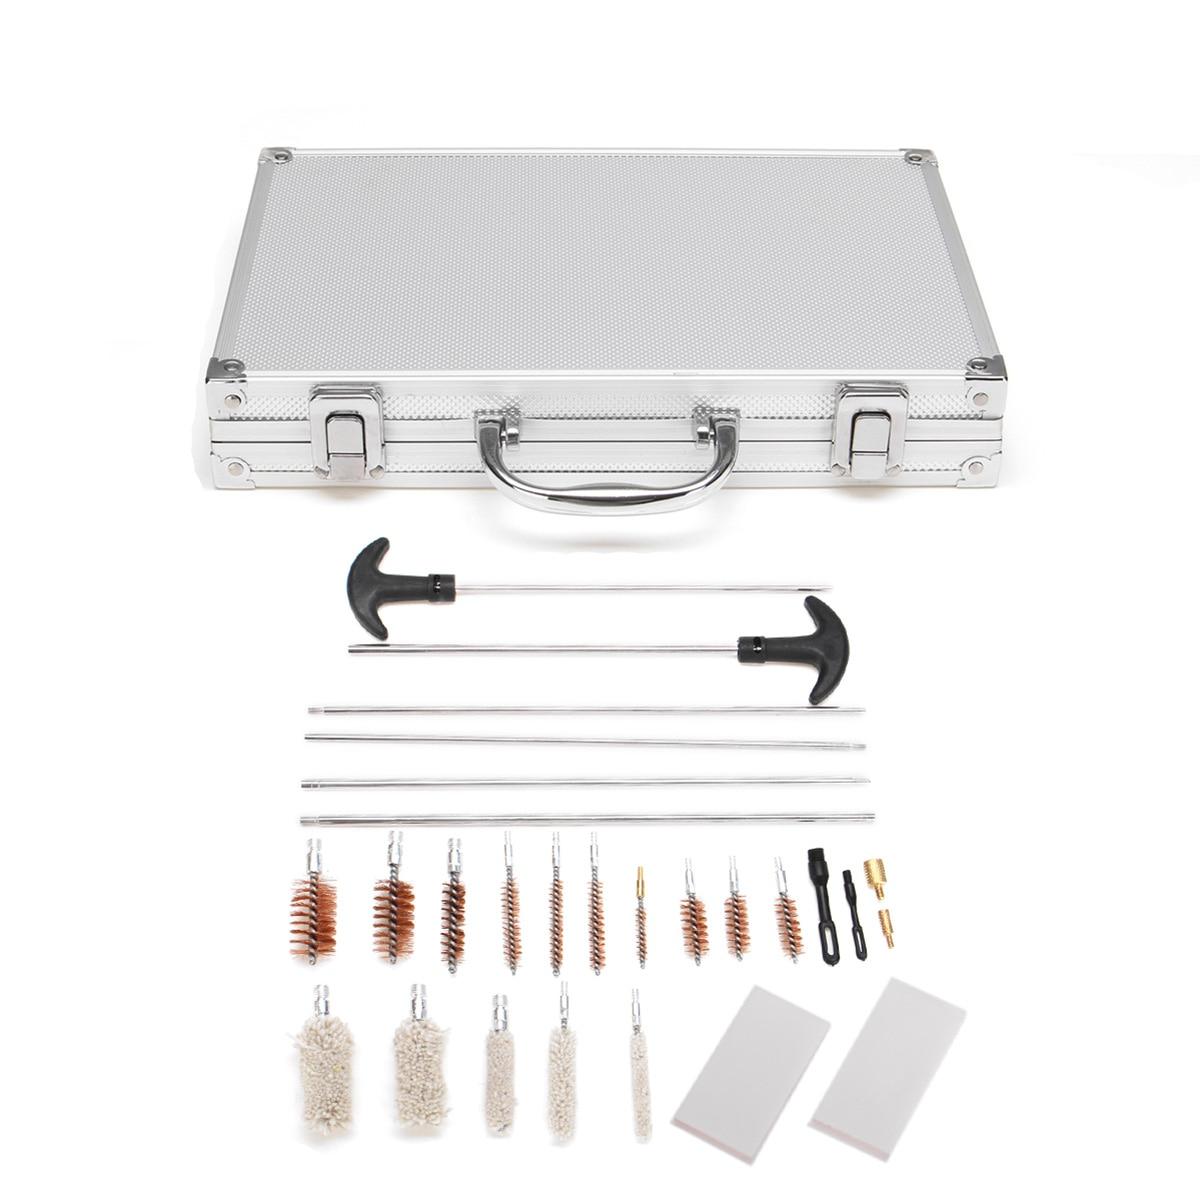 106 pçs universal kit de ferramentas de